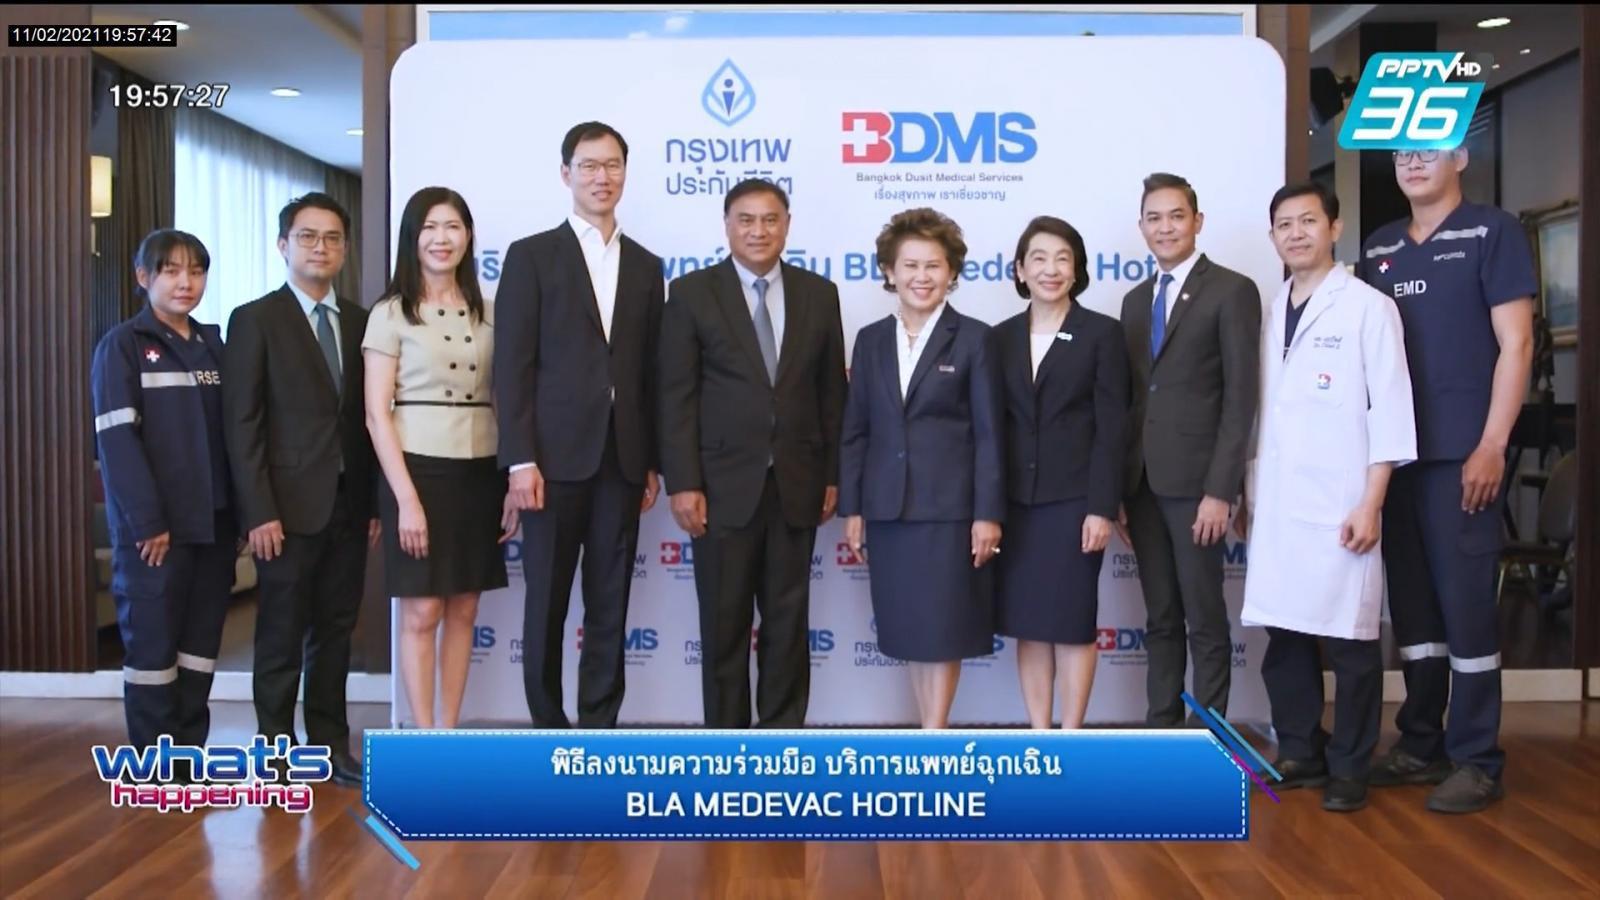 "BDMS พิธีลงนามความร่วมมือ บริการแพทย์ฉุกเฉิน ""BLA MEDEVAC HOTLINE"""